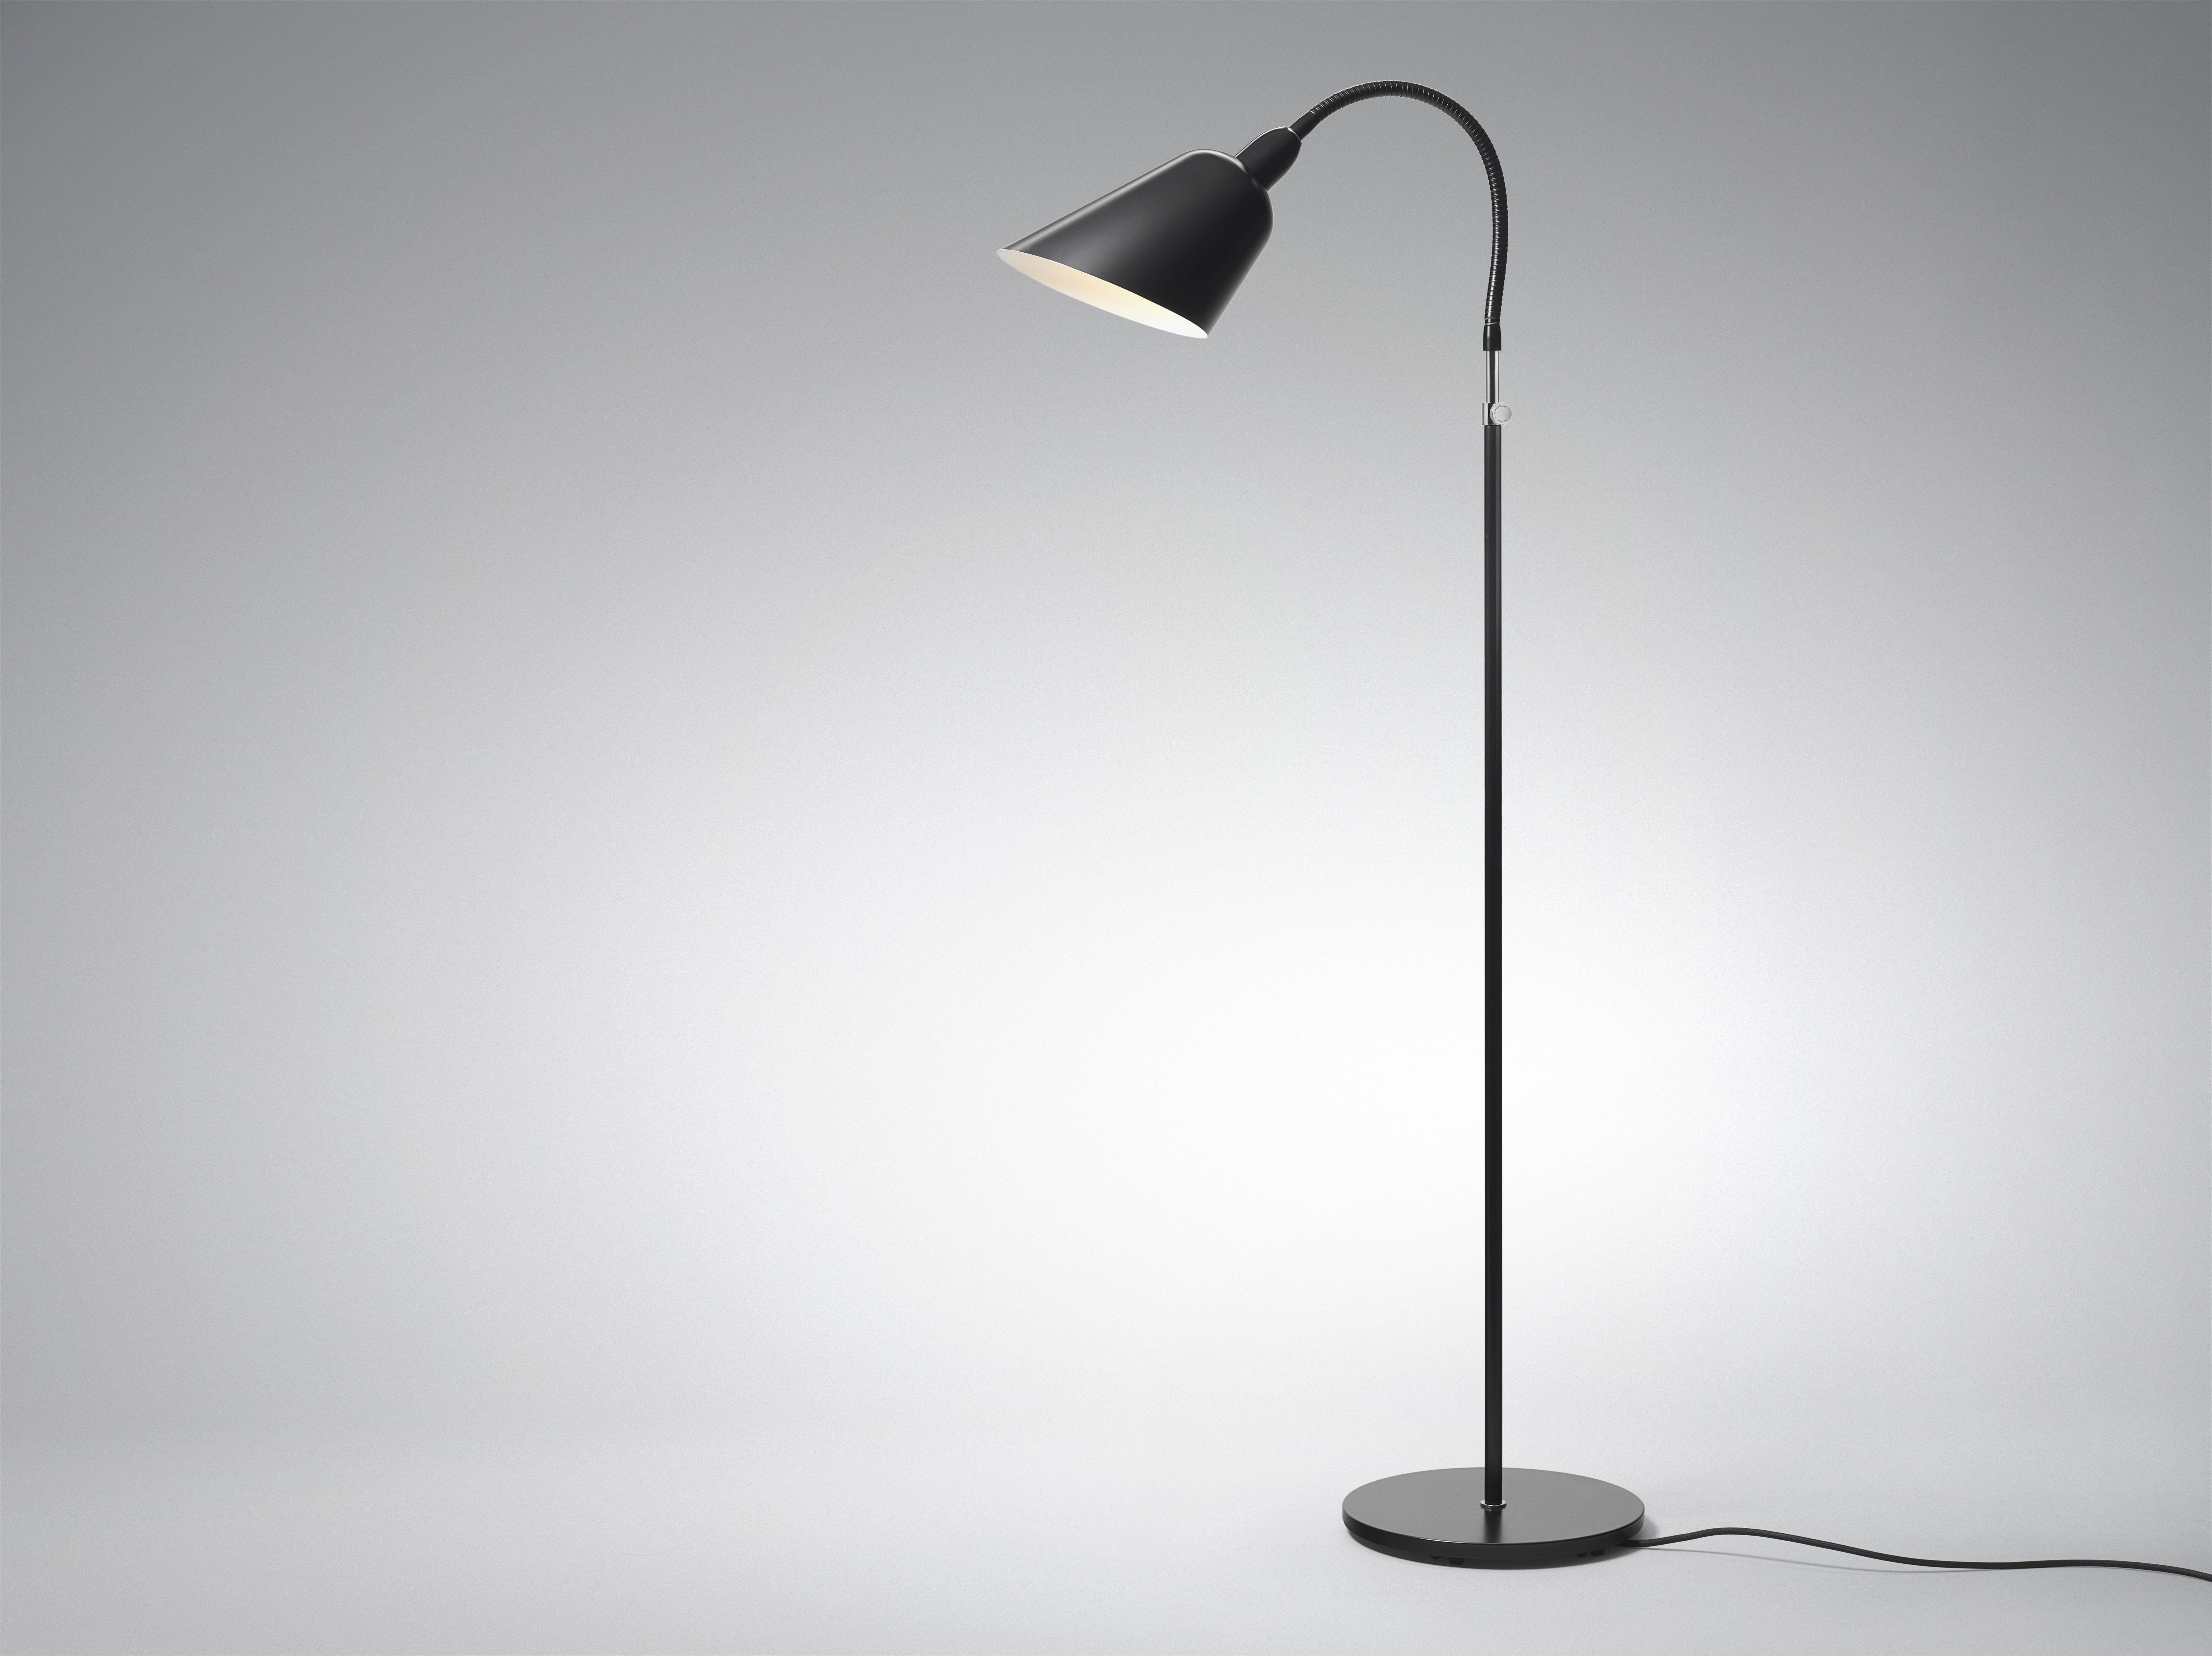 lampadaire made in design